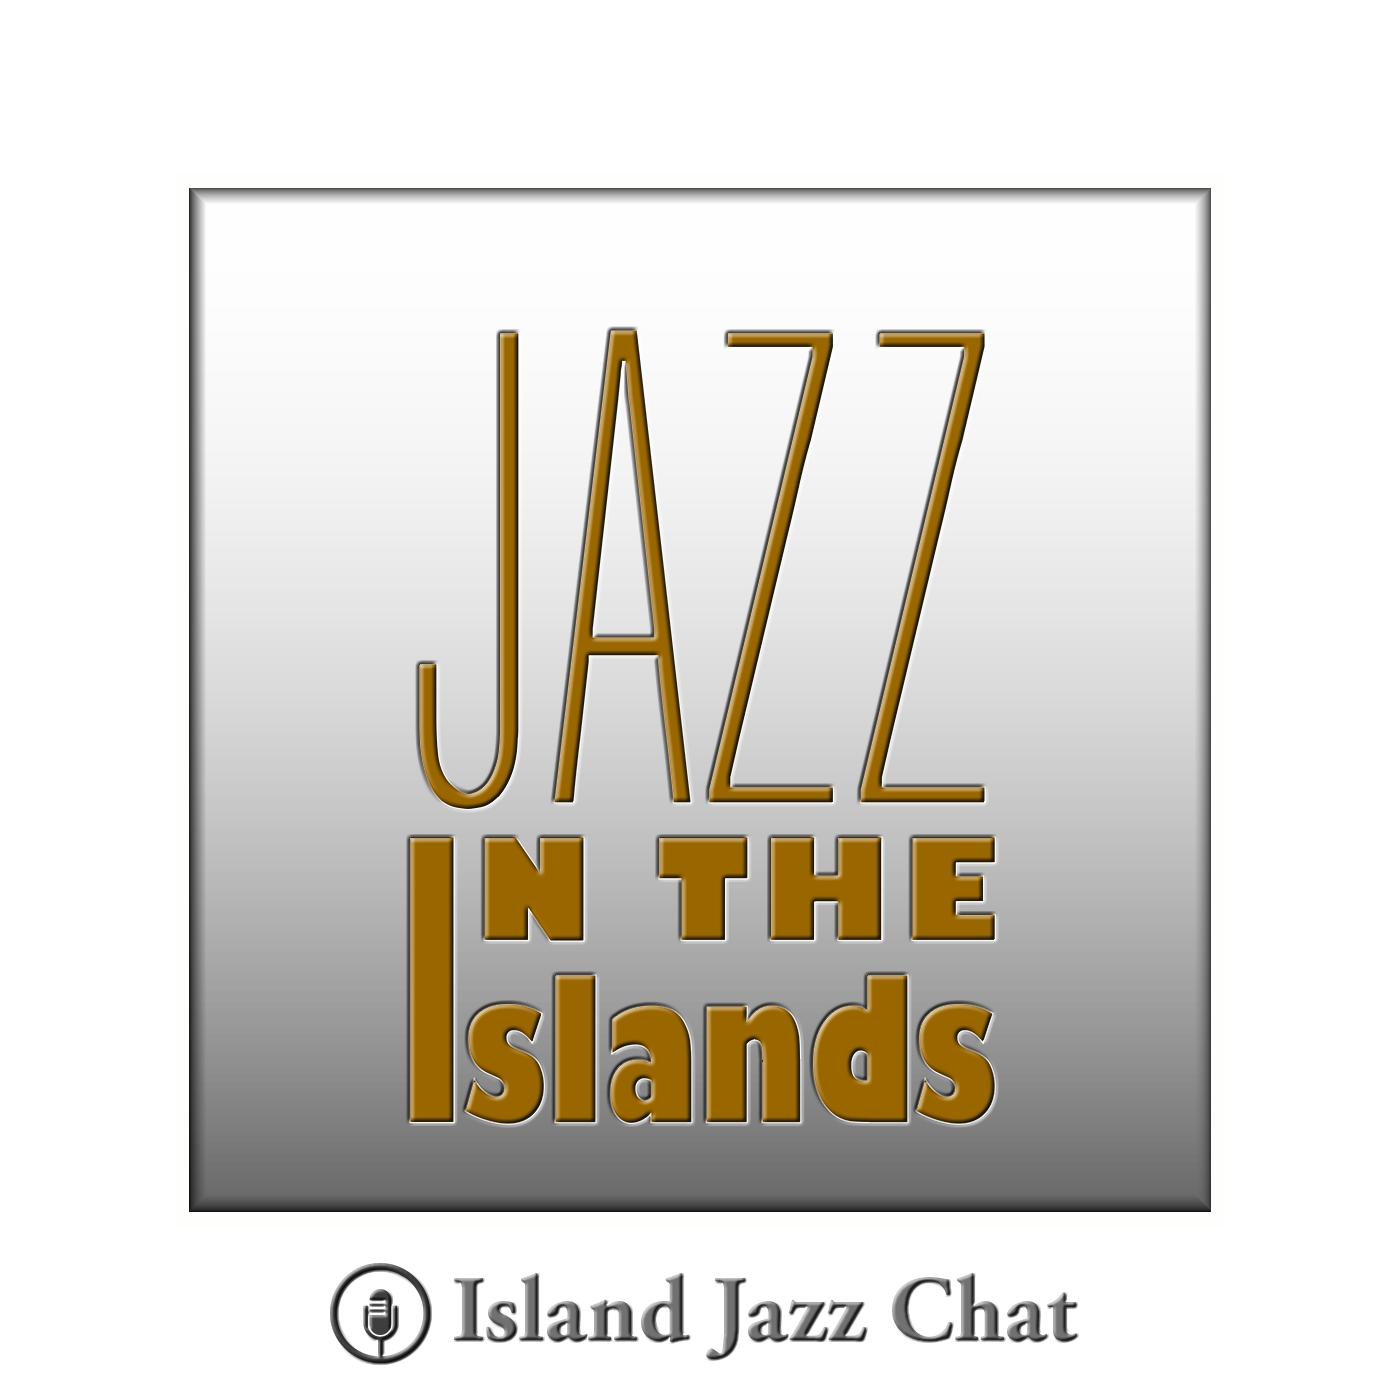 Island Jazz Chat